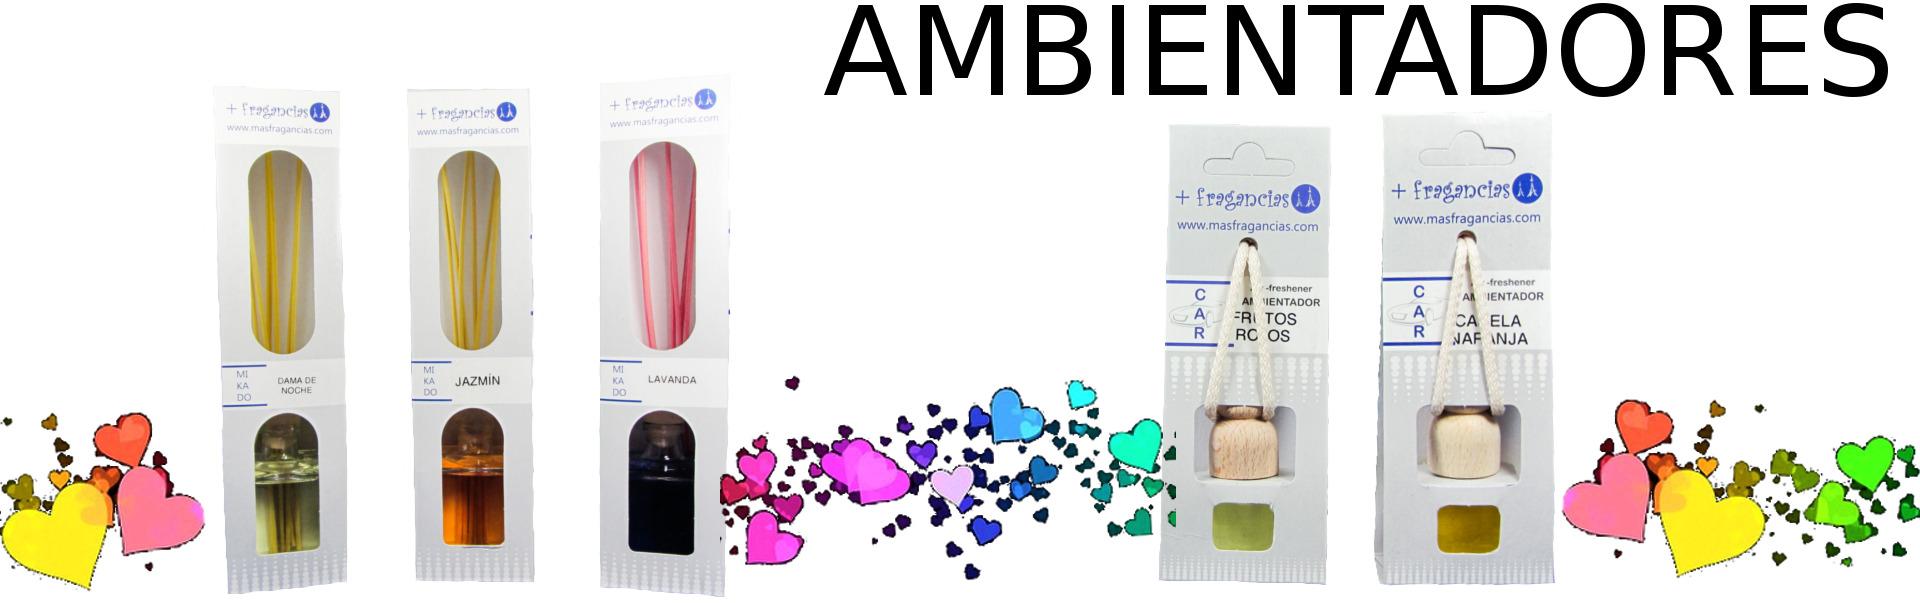 Ambientadores - mikados - sachets - aceites - aromas - esencias - colonias - perfumes baratos imitación